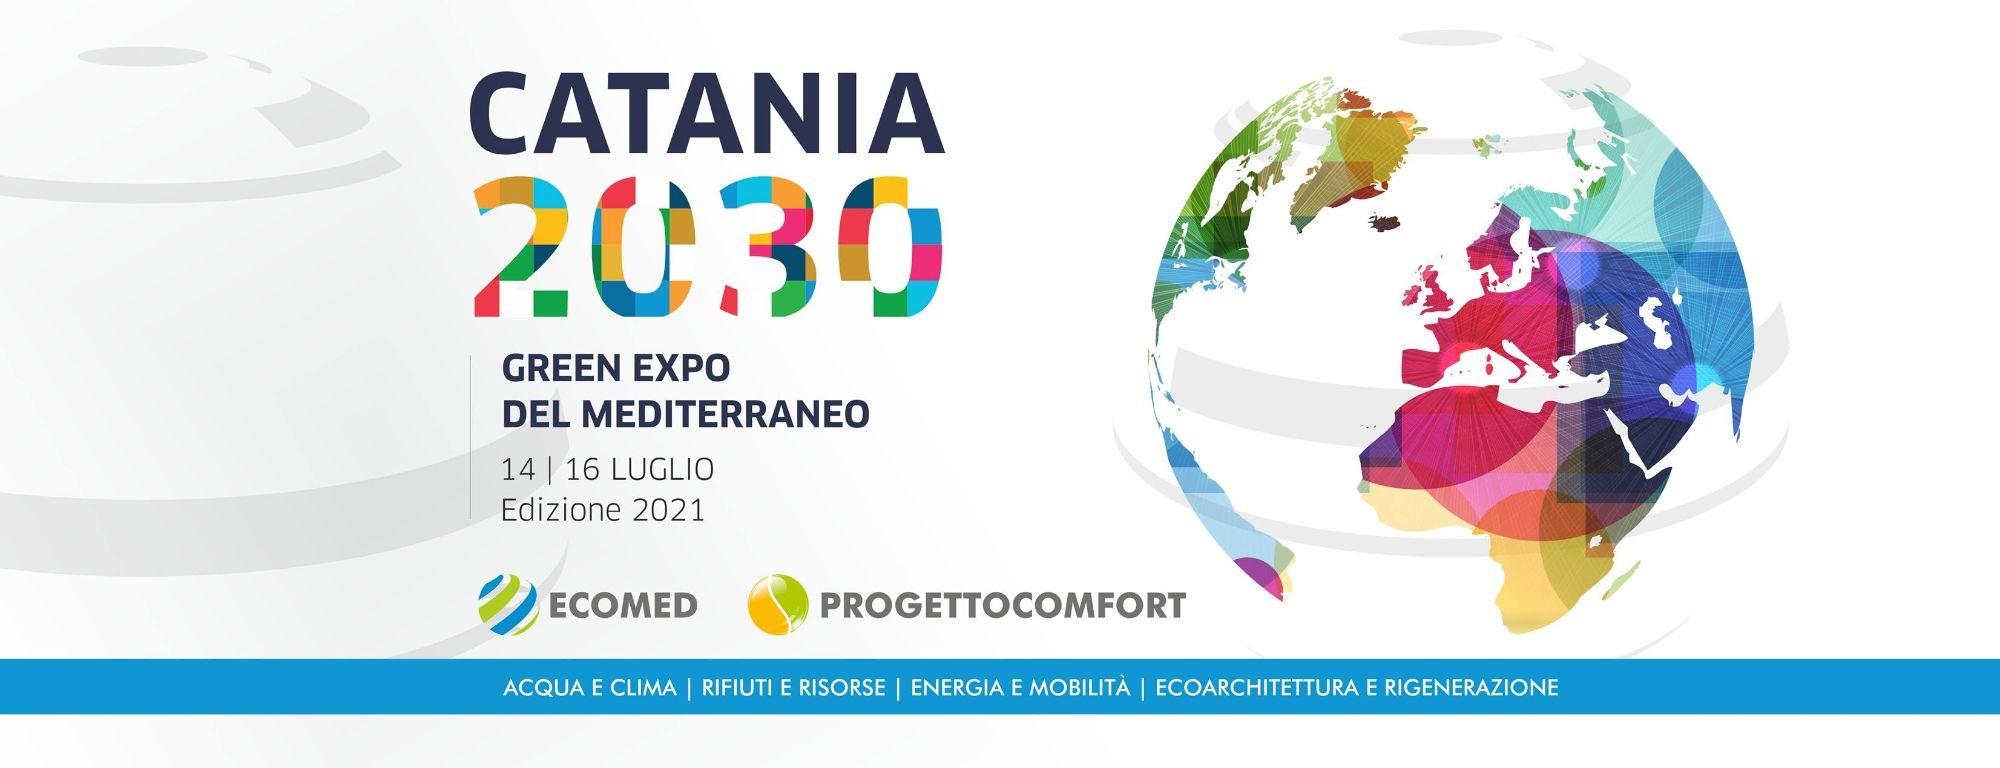 ecomed-progetto-comfort-catania2030-1623732222.jpg